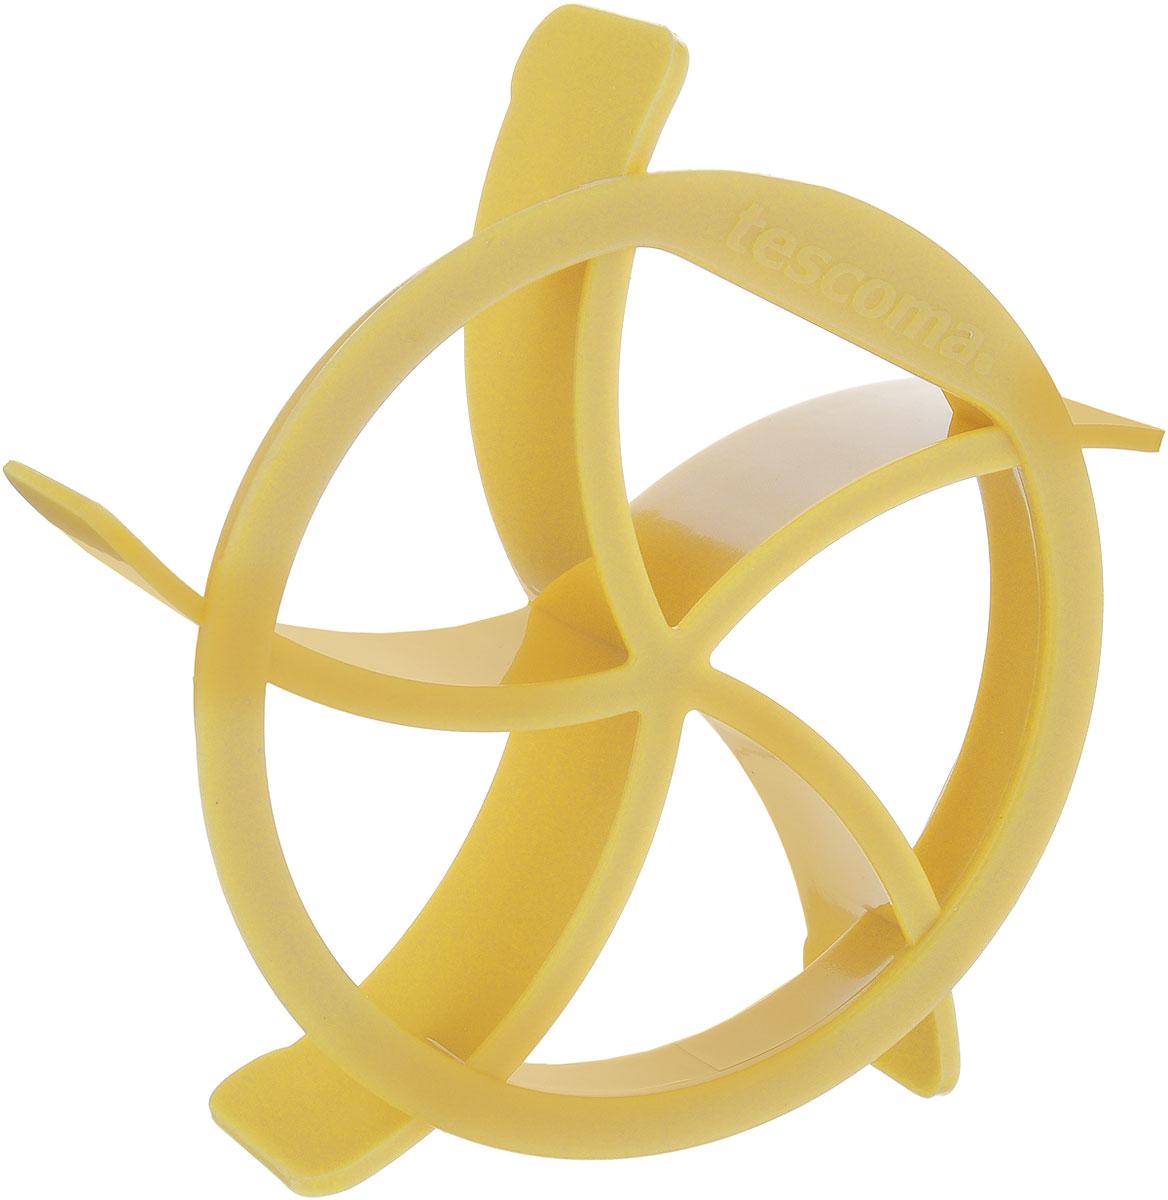 Формочка для кайзерок Tescoma Delicia, диаметр 9 см630084_желтый